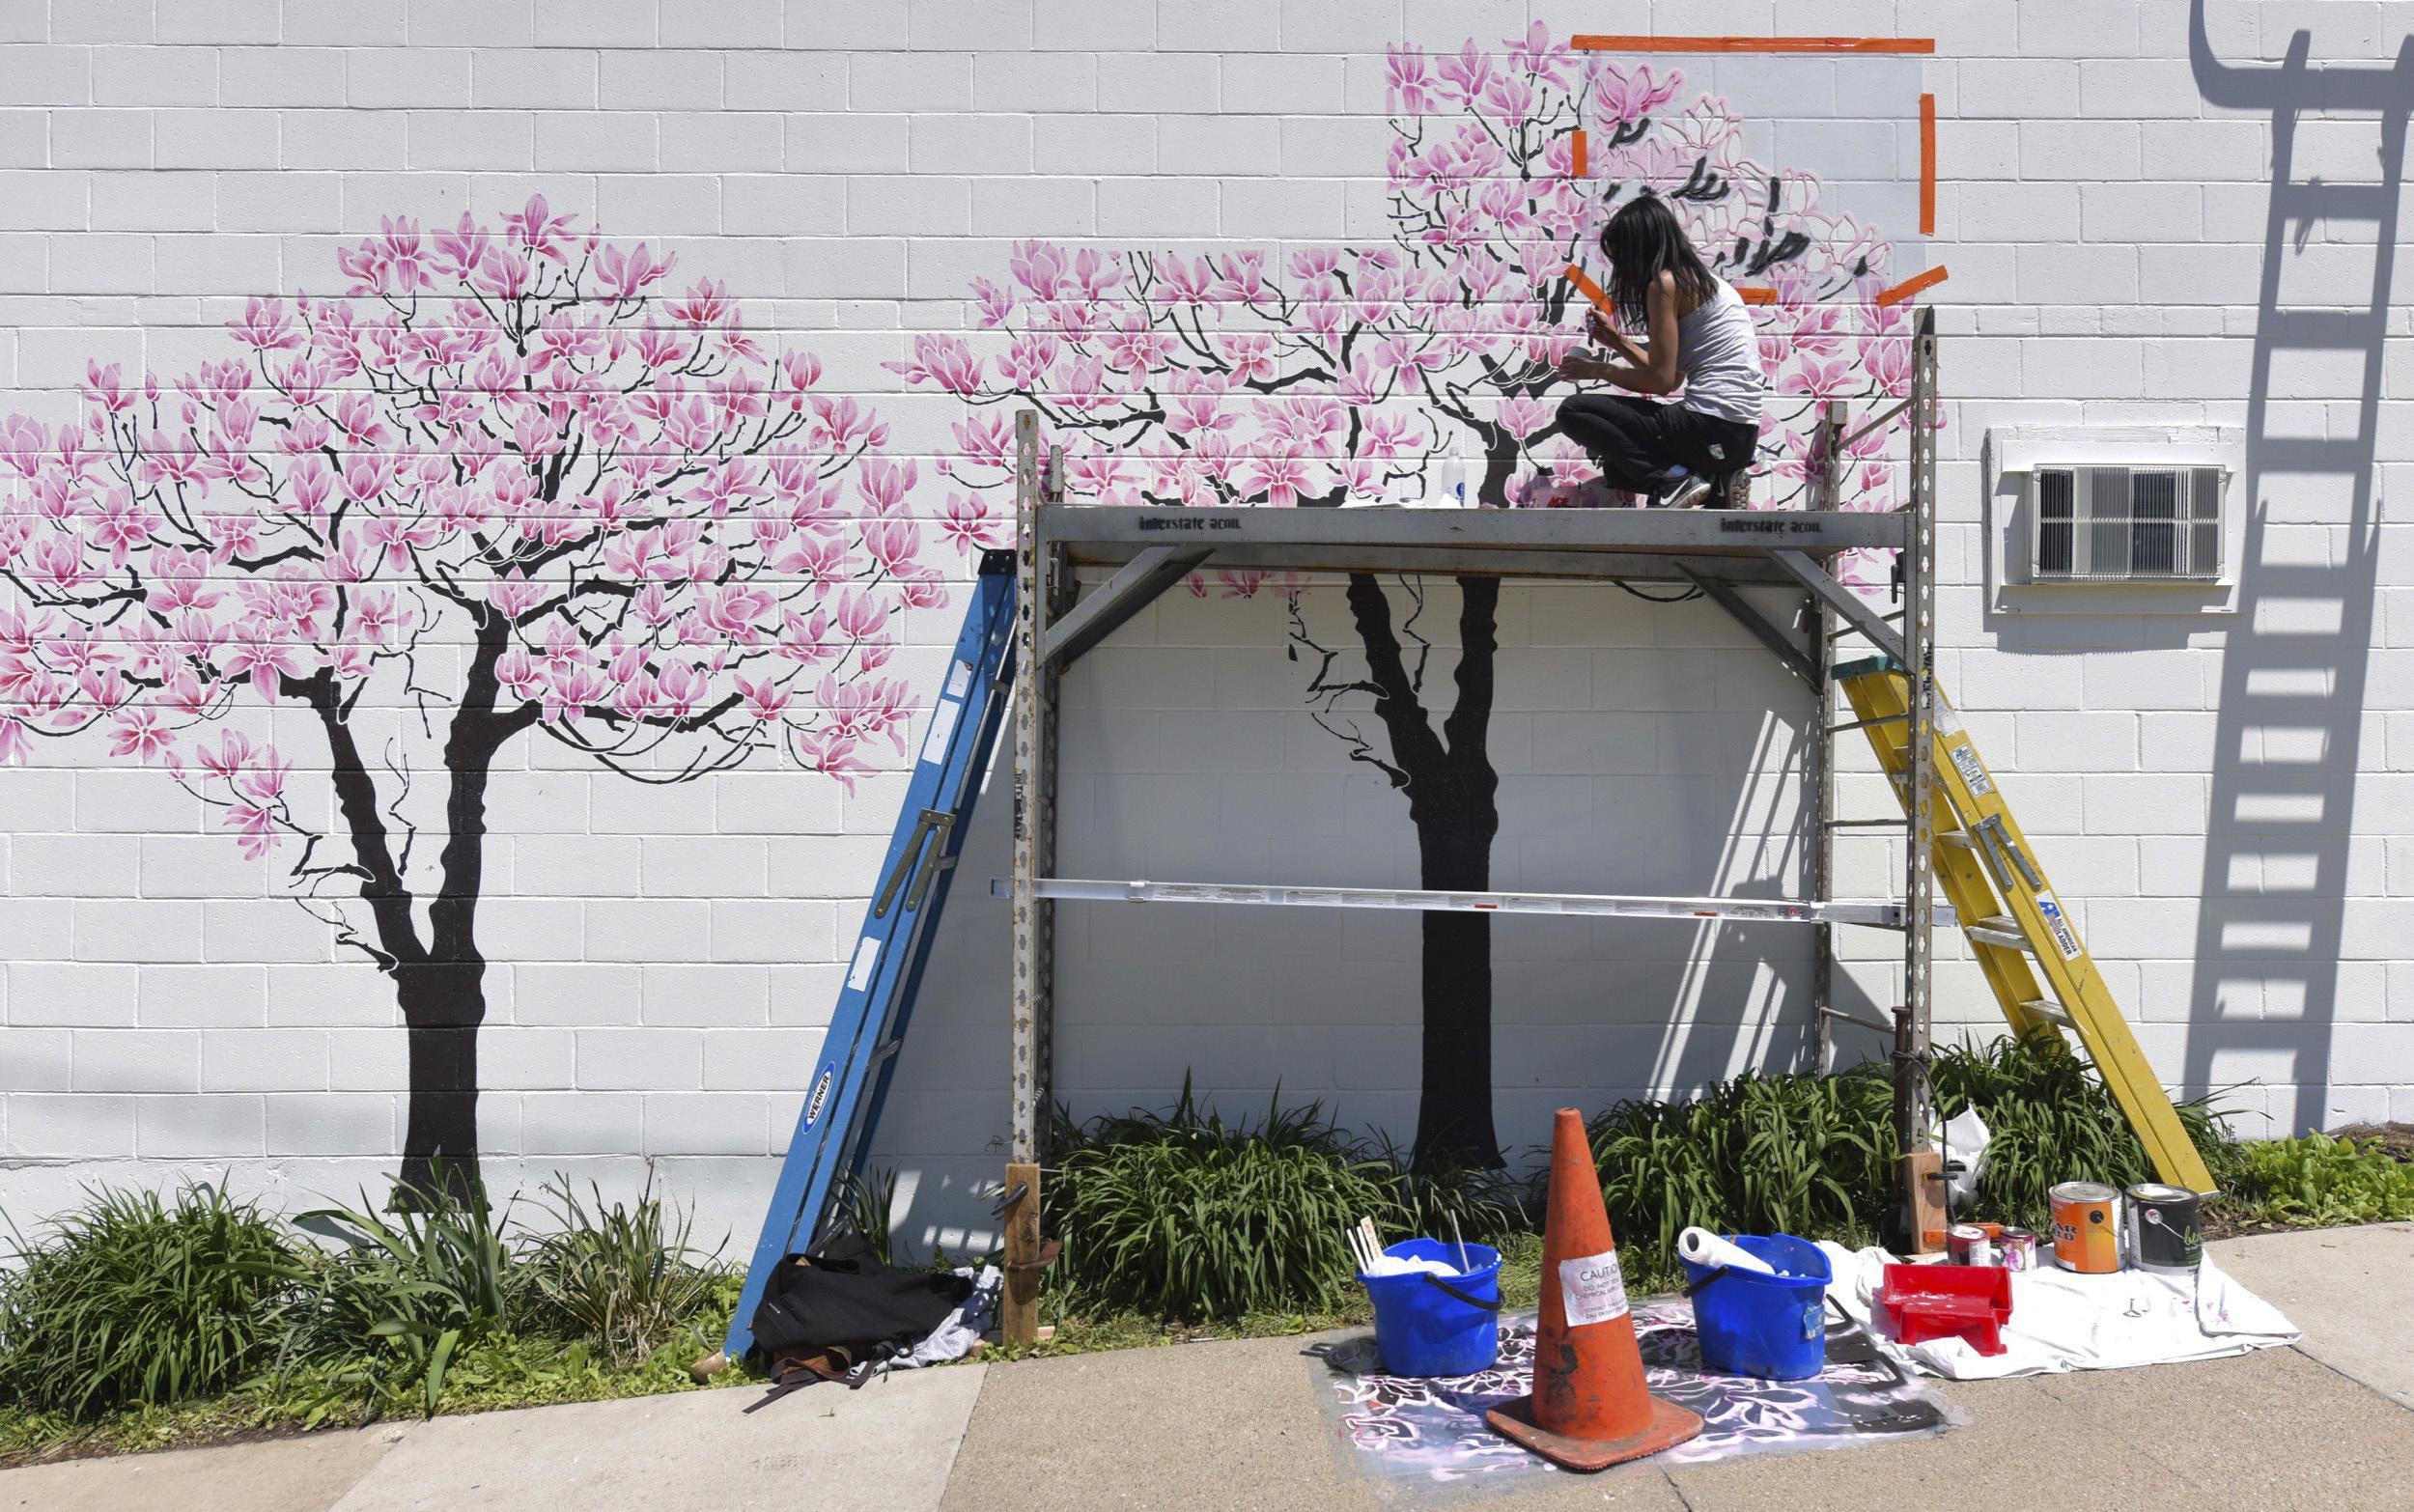 Graffiti wall ann arbor - Ann Arbor Fights Graffiti With Tree Themed Art Gets Results Washington Times